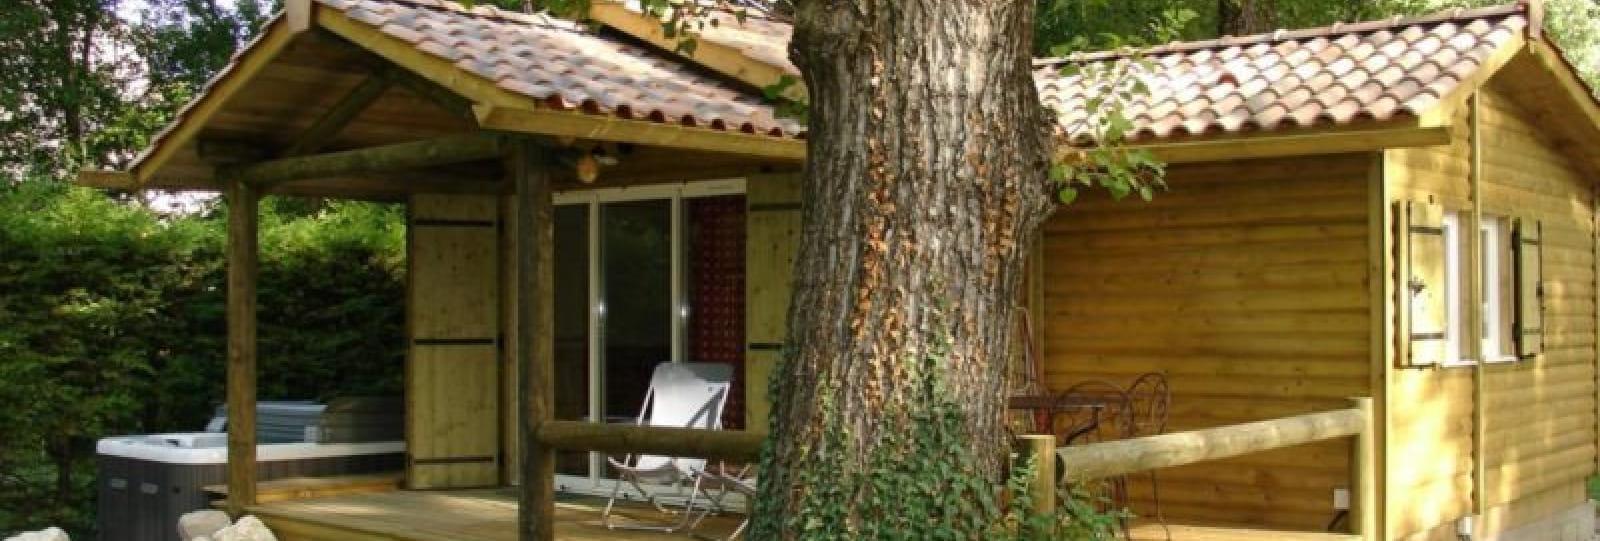 Camping Domaine Provençal